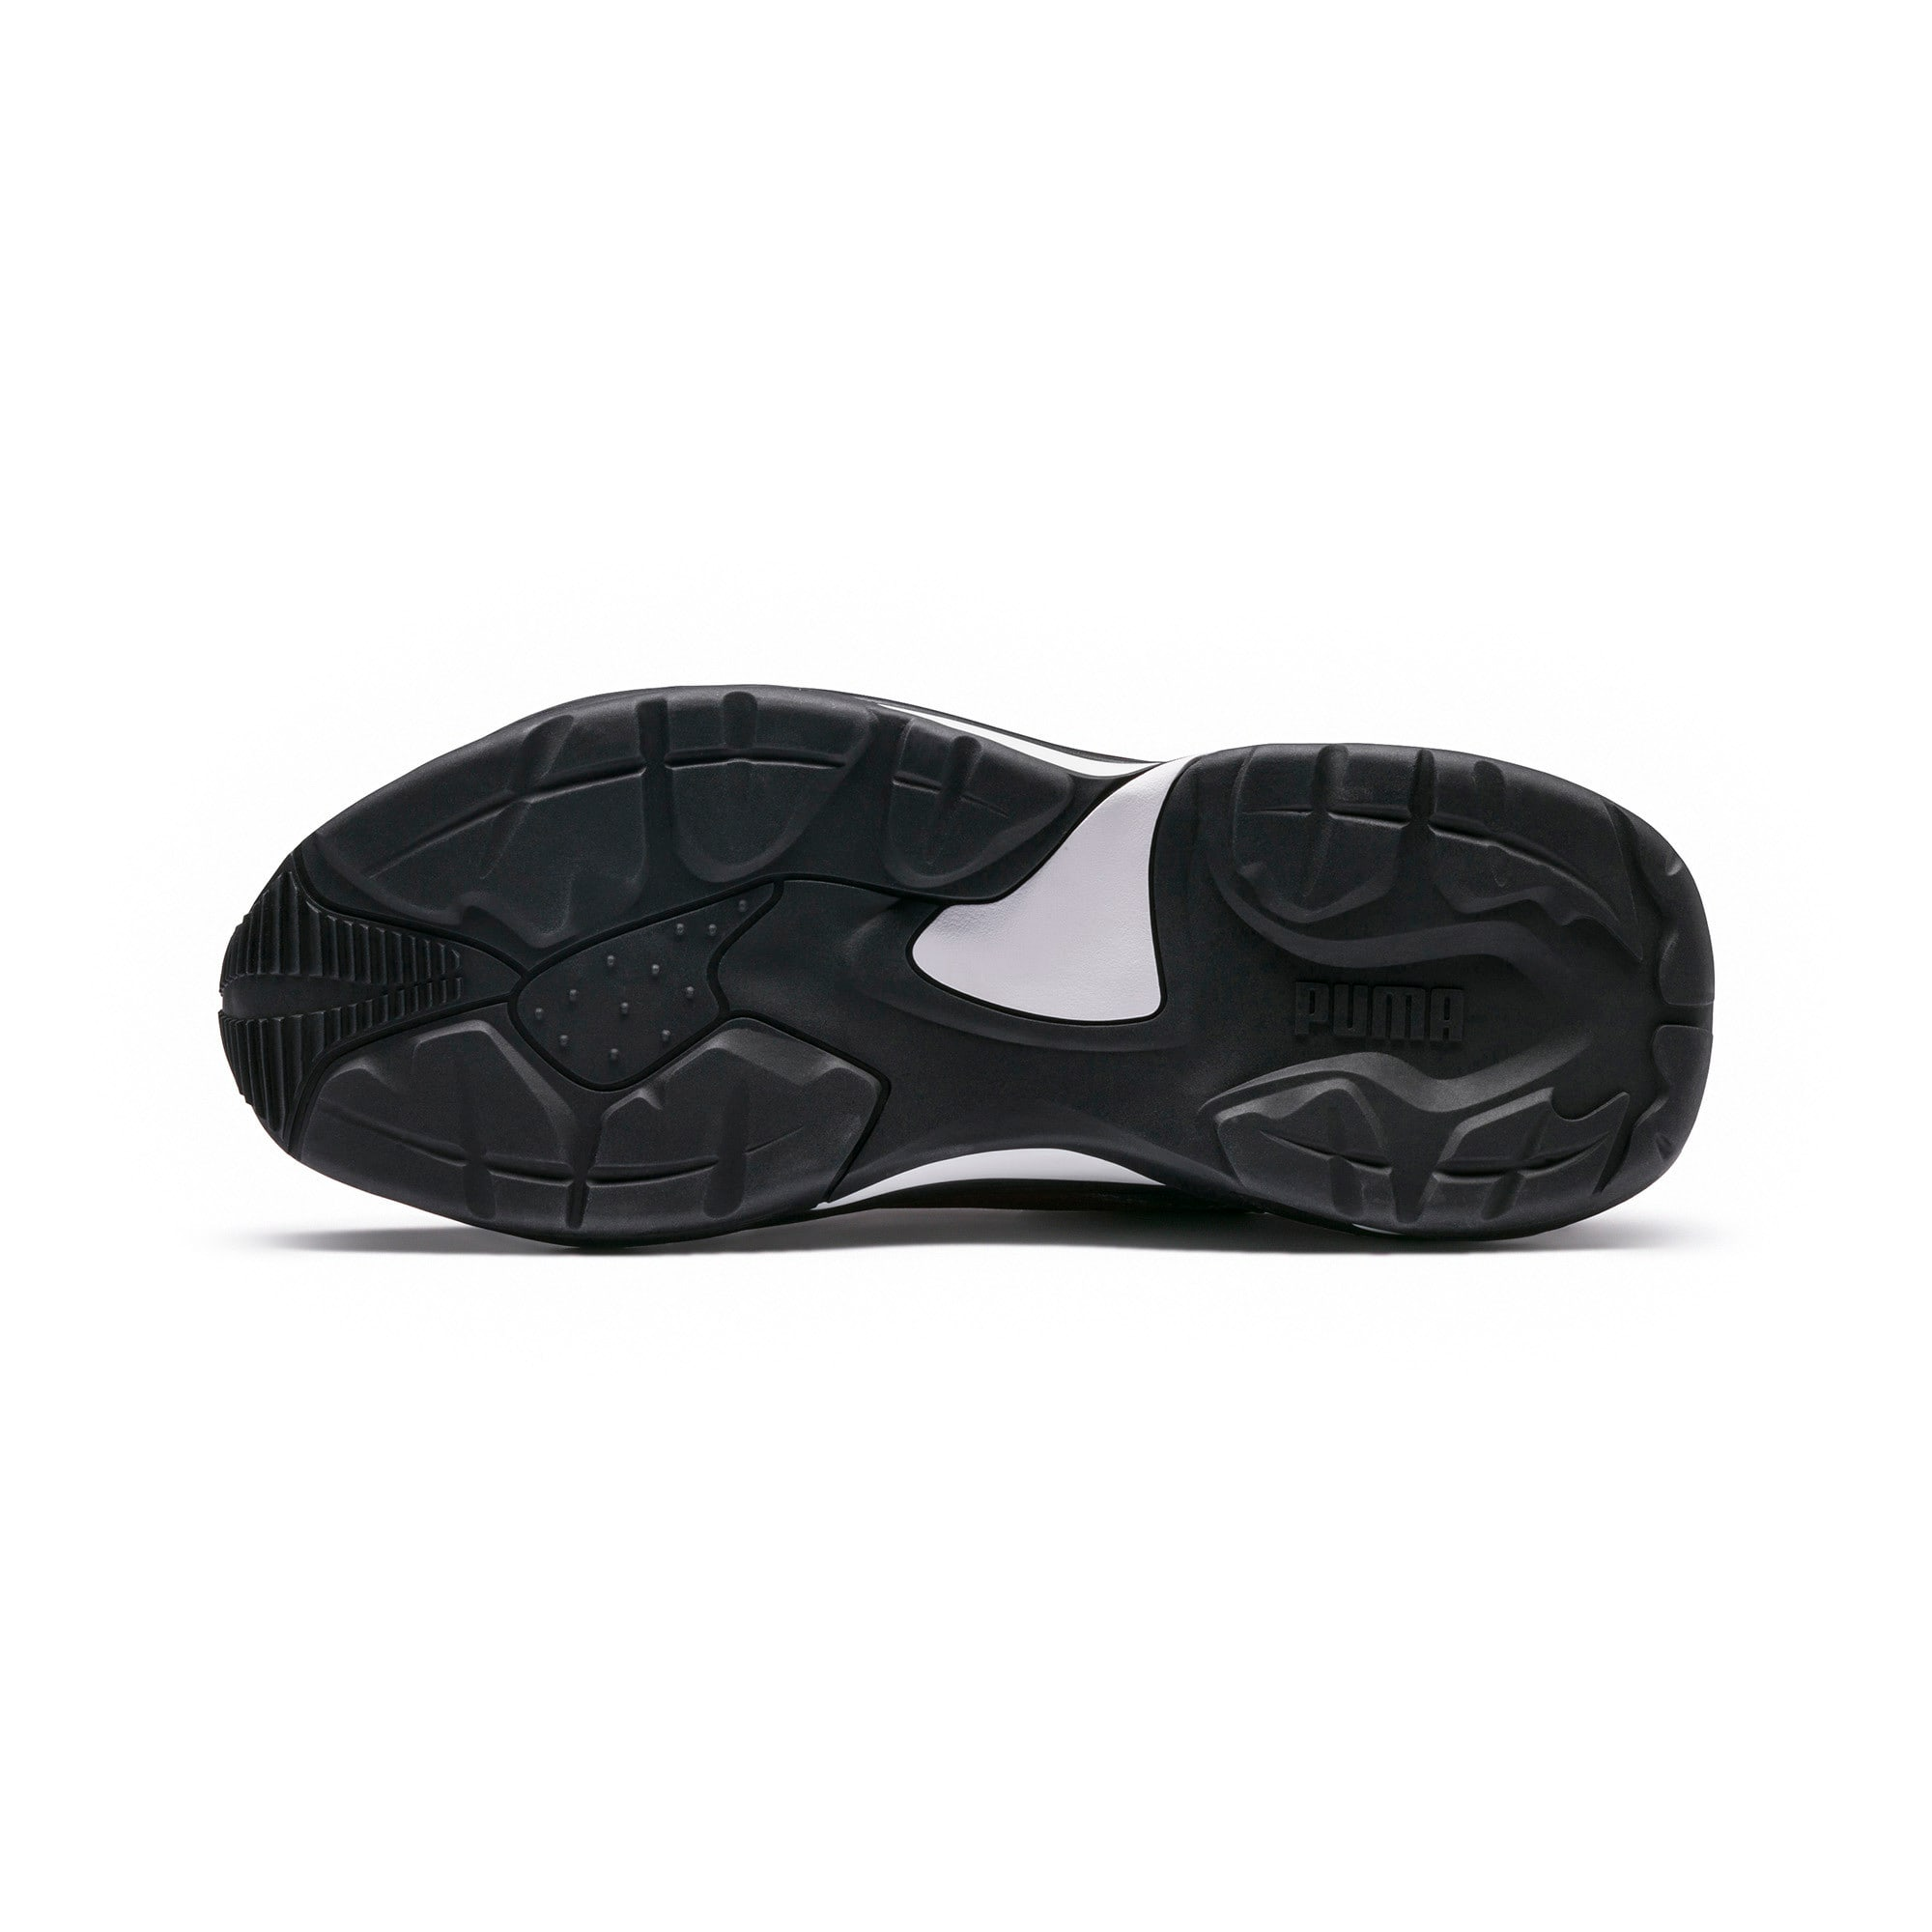 Miniatura 3 de Zapatos deportivos Thunder Spectra, Rhododendron-P Black-T Port, mediano